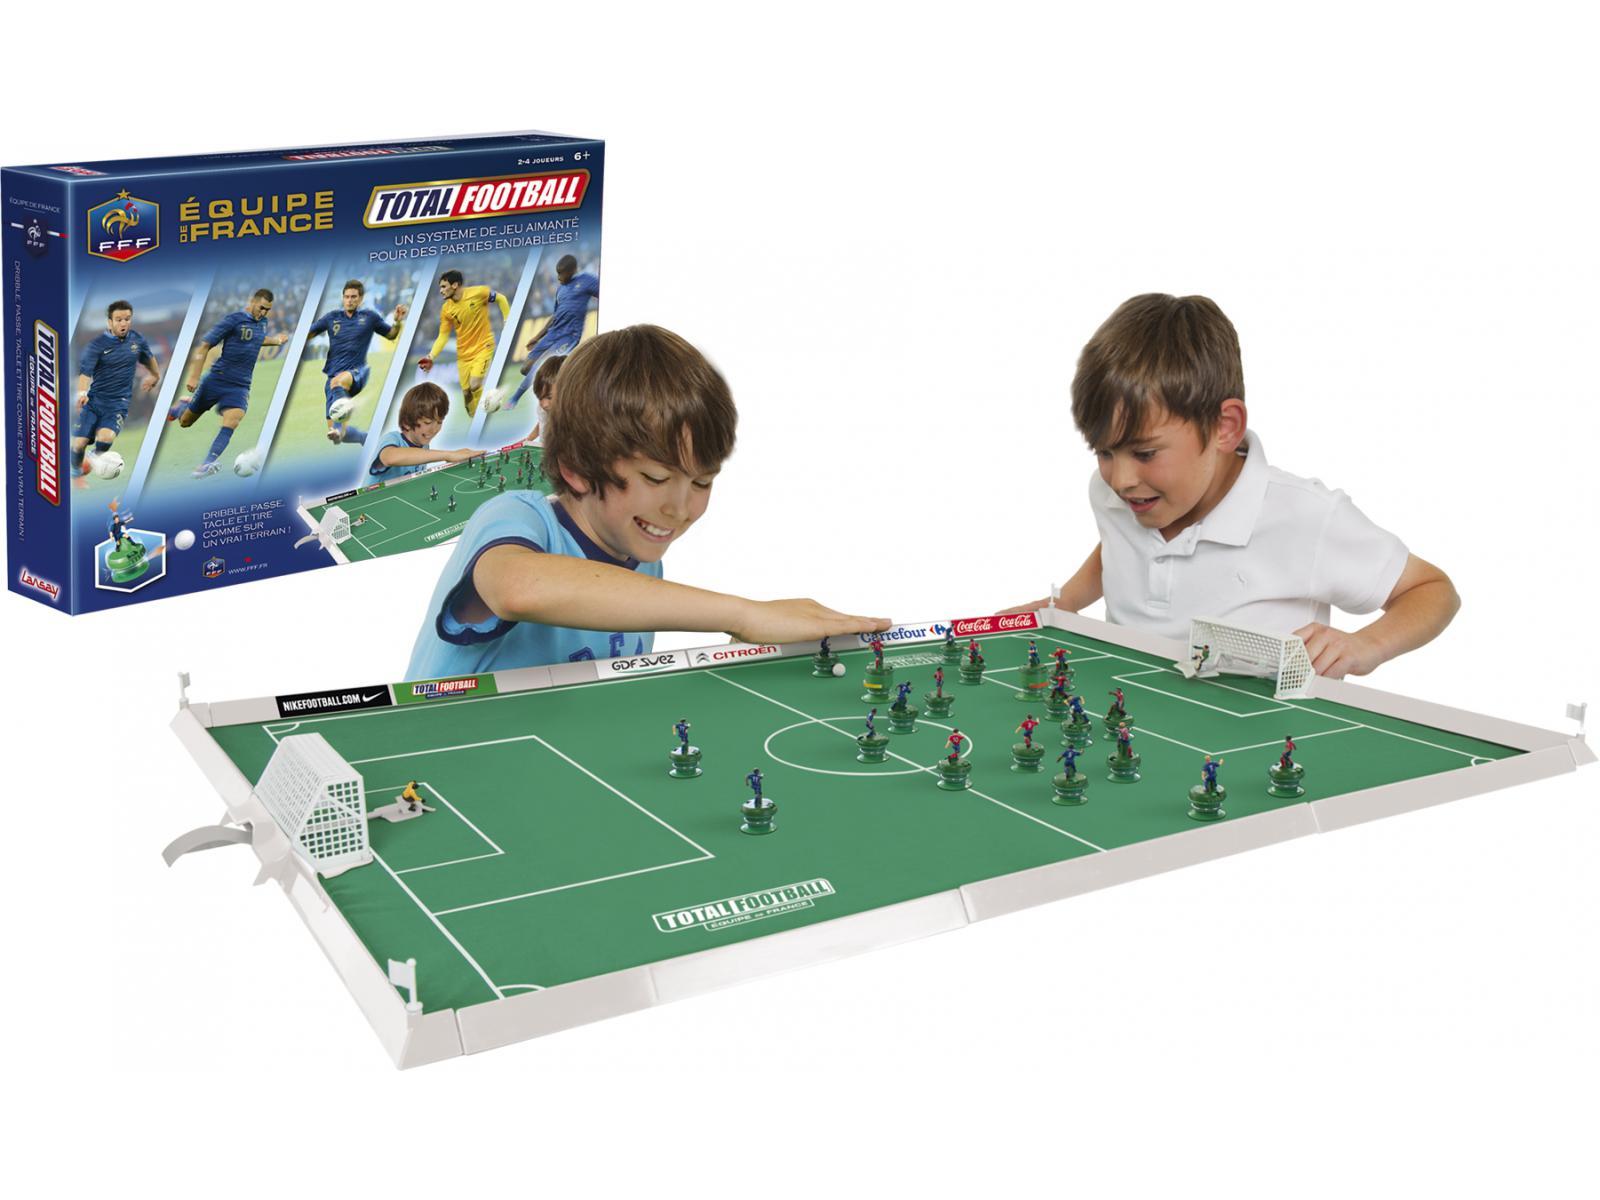 http://www.jeuxetjouetsenfolie.fr/image/207024/1600x1200/0/lansay-26055-total-football-equipe-de-france.jpg